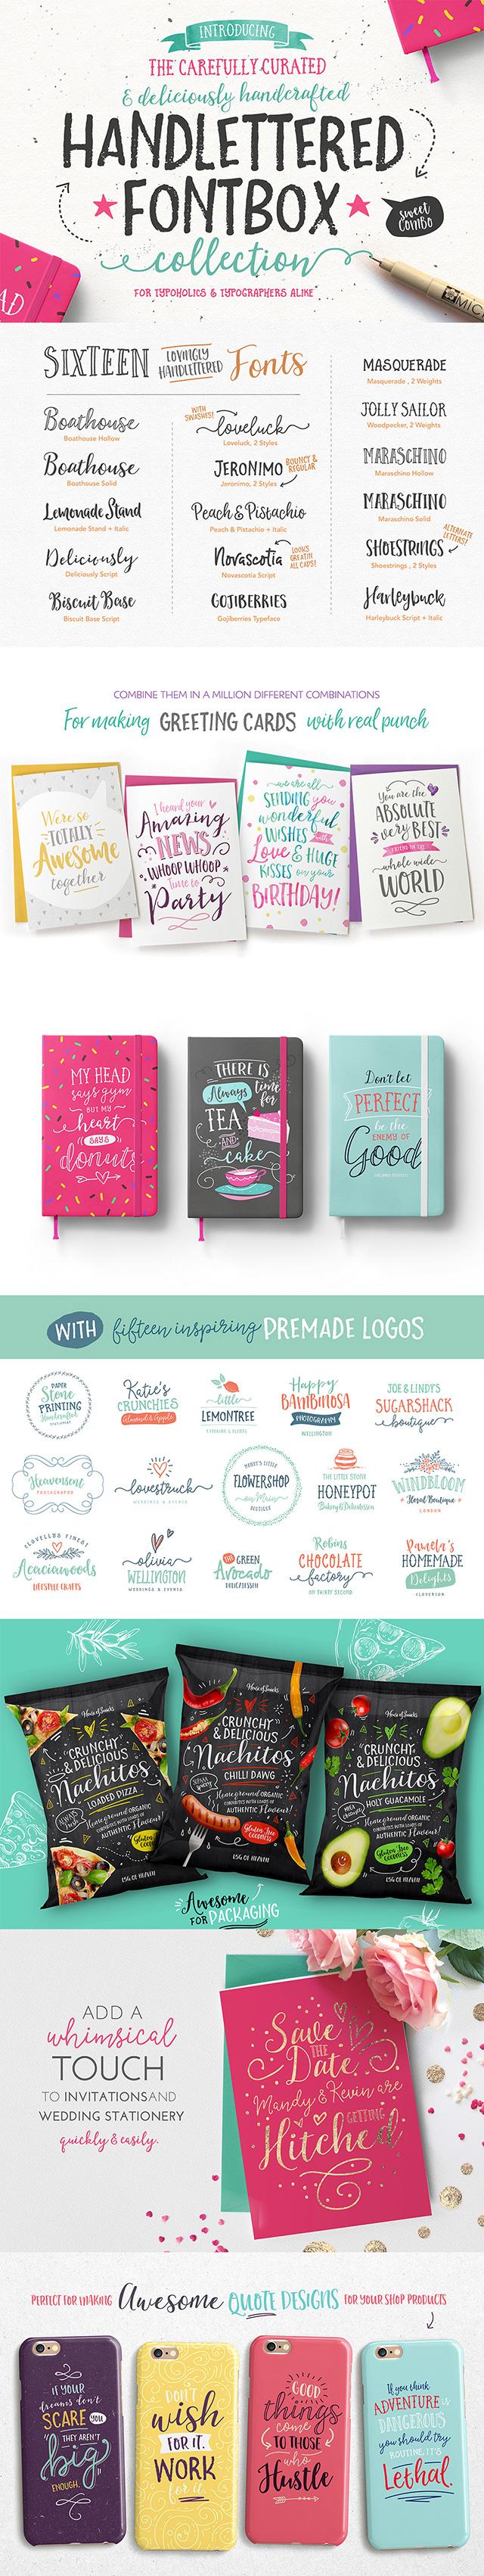 Letterbox Fonts